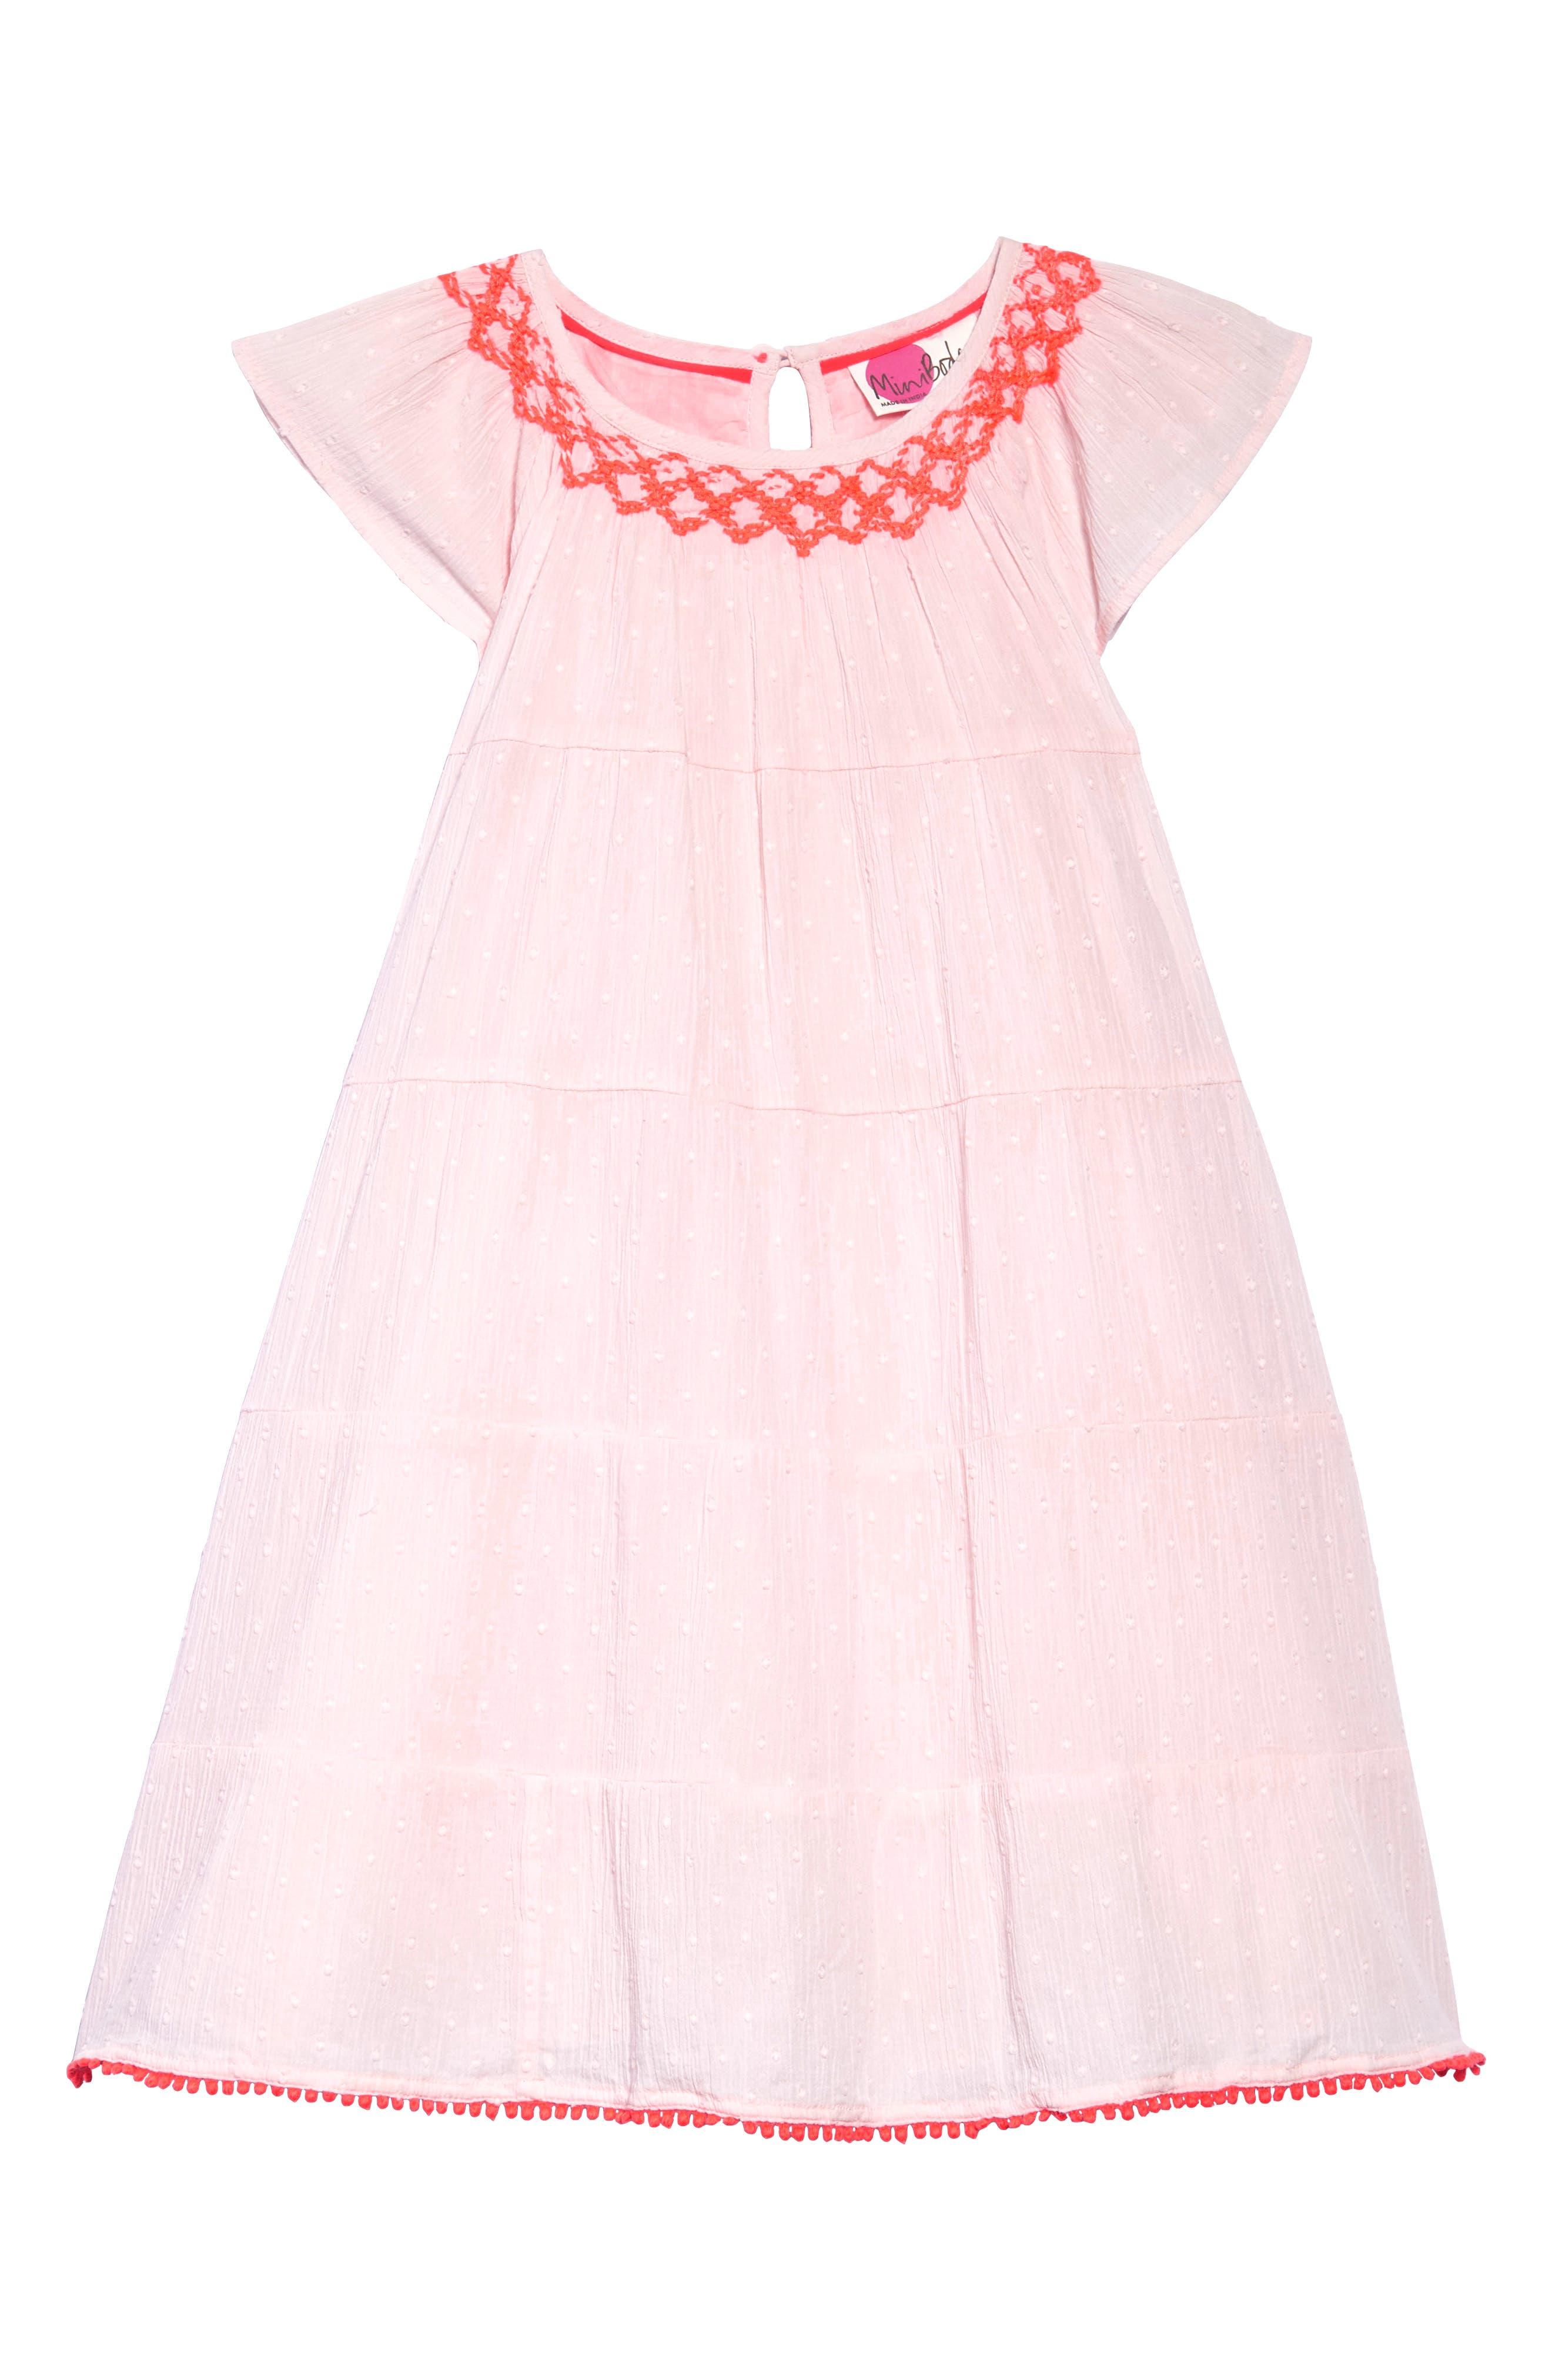 Twirly Dress,                         Main,                         color, Pink Mist Pnk